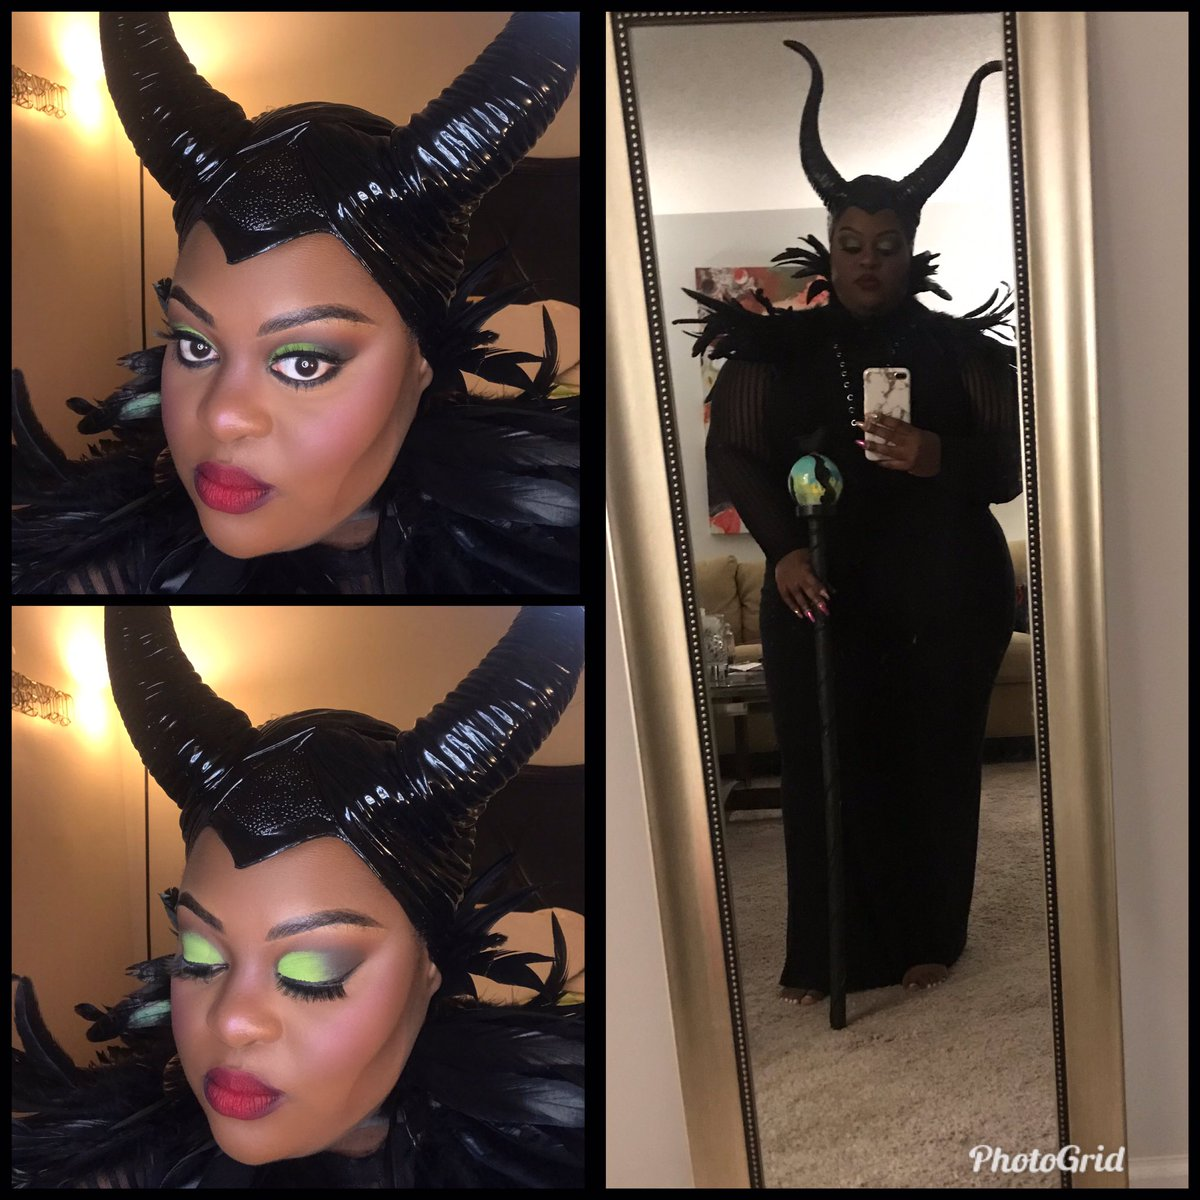 @fatgirlsbeauty #Maleficent2 #halloween2019 #plusizecosplay